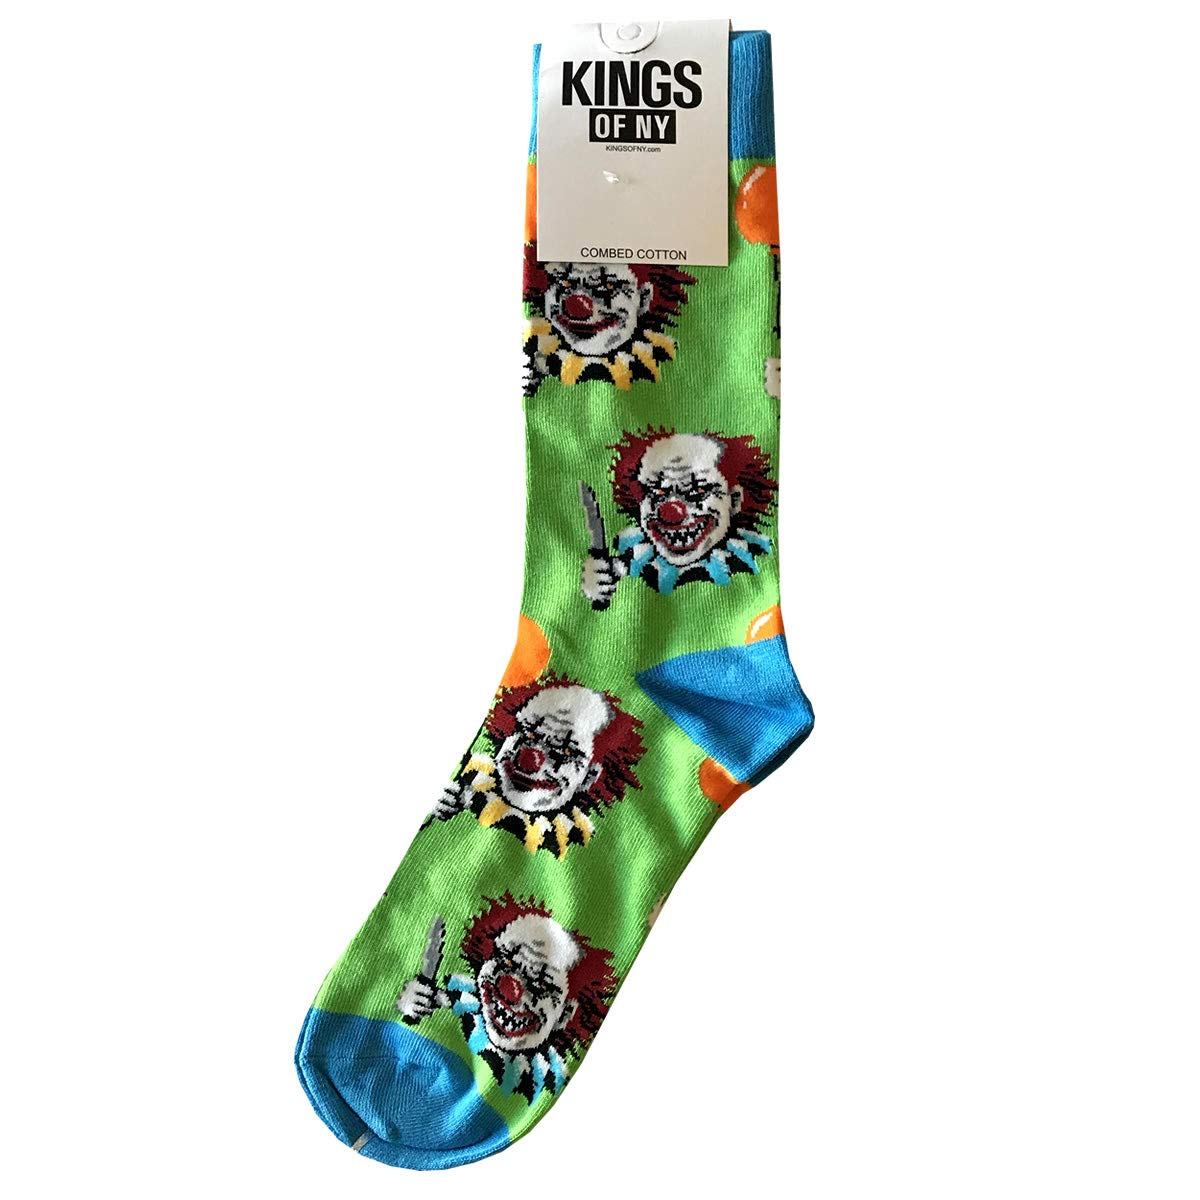 Crazy Killer Clown Funny Horror Novelty Mens Cotton Socks